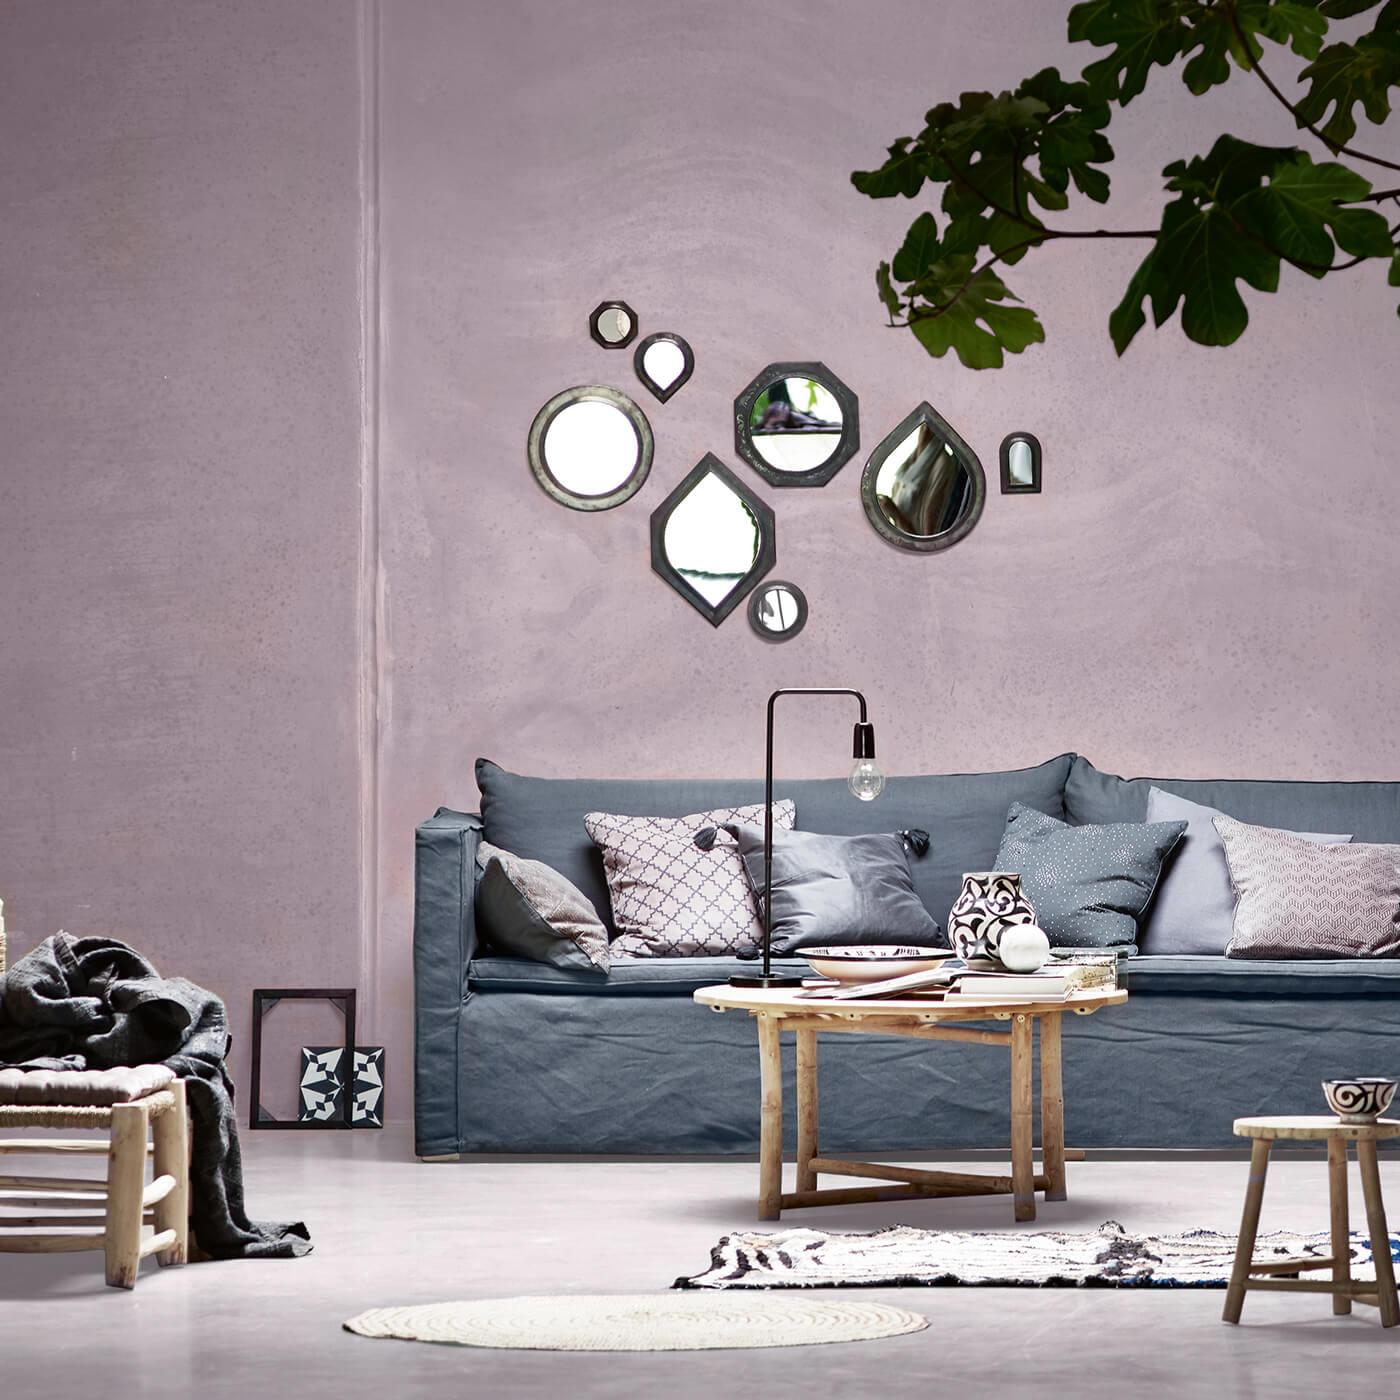 tine k home spiegel set 4 graphische formen big ca 30 x 30 cm. Black Bedroom Furniture Sets. Home Design Ideas